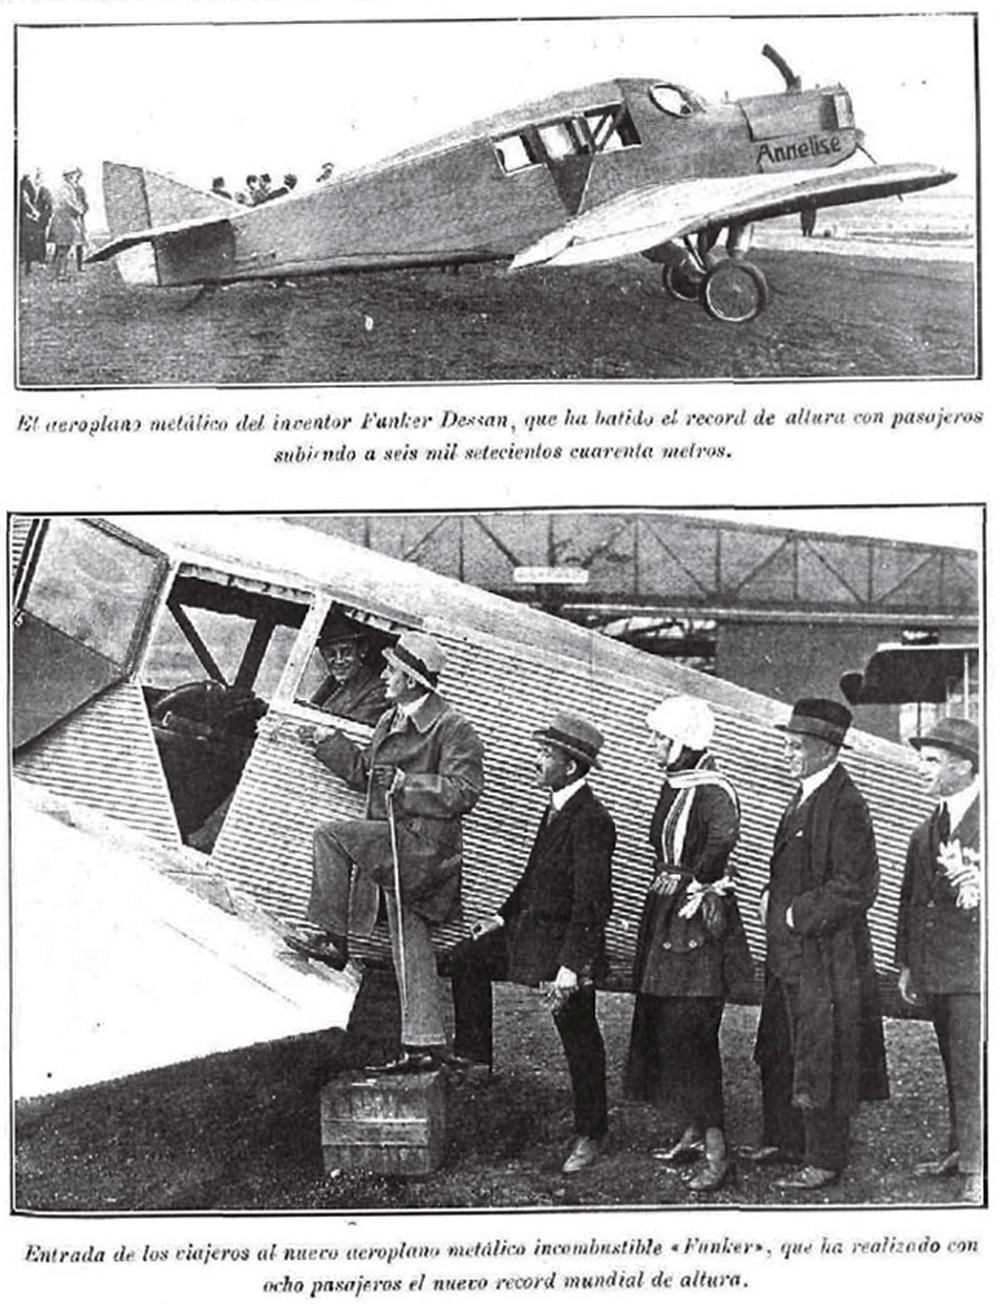 1919-nov-10-alrdmundo-junke